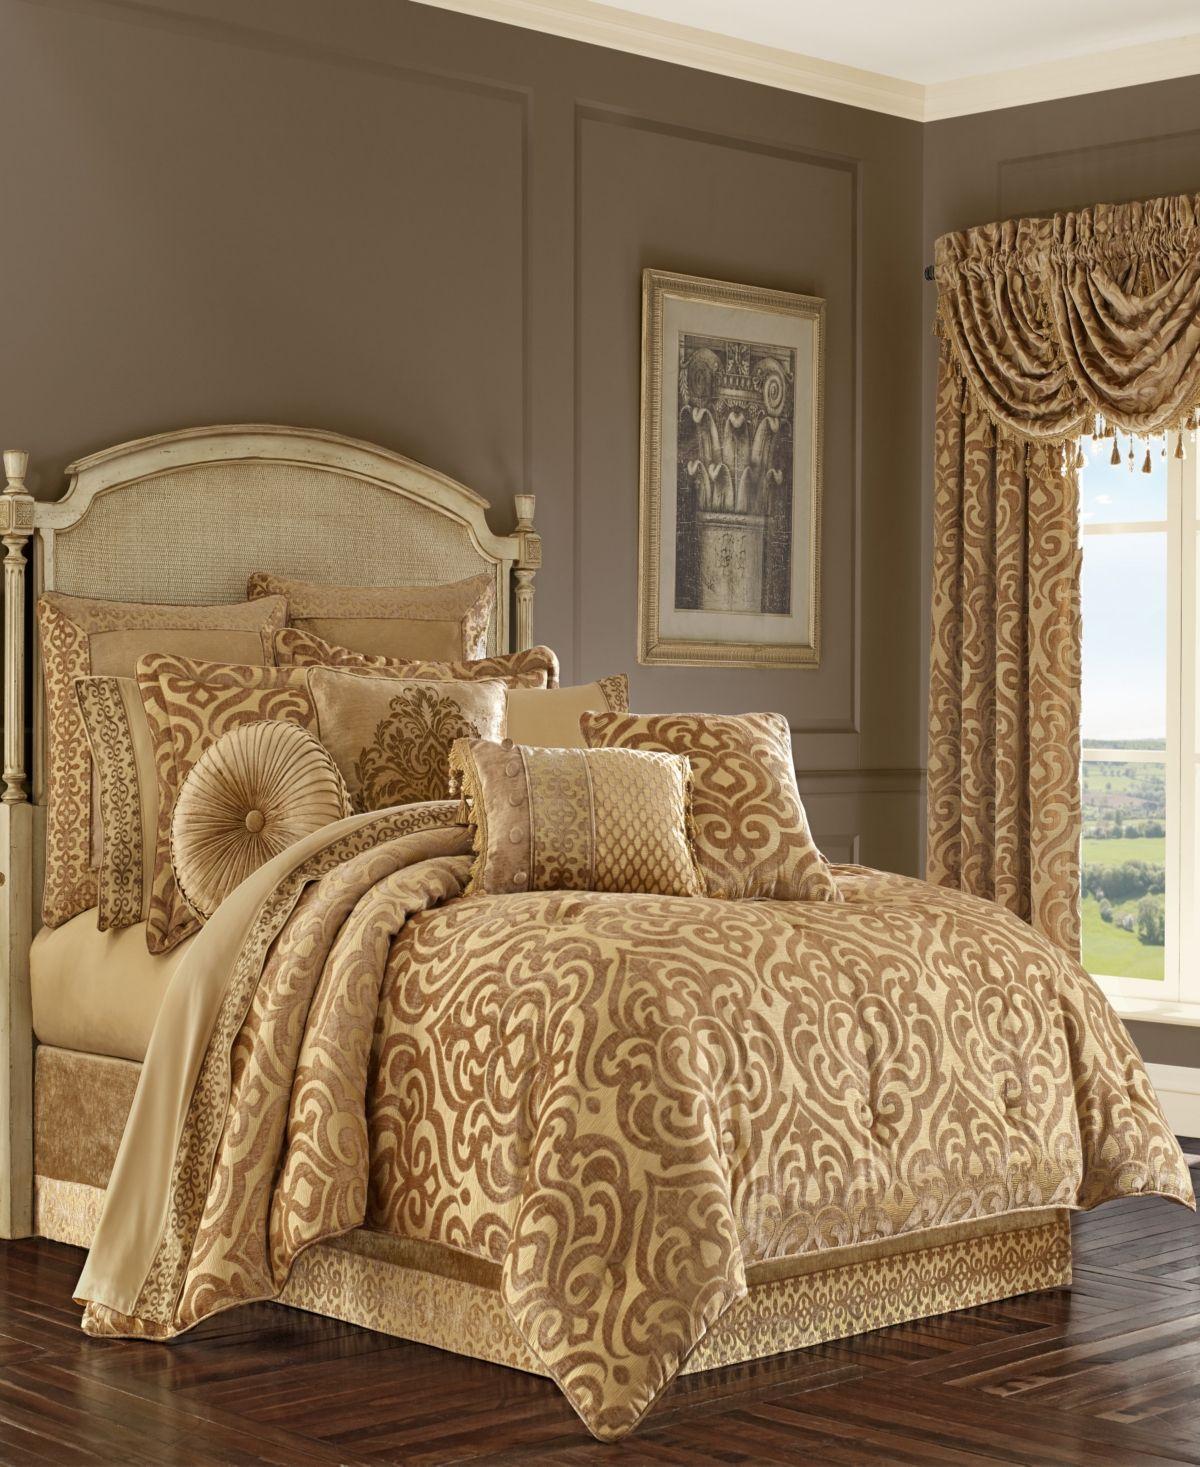 J Queen New York J Queen Sicily Bedding Collection